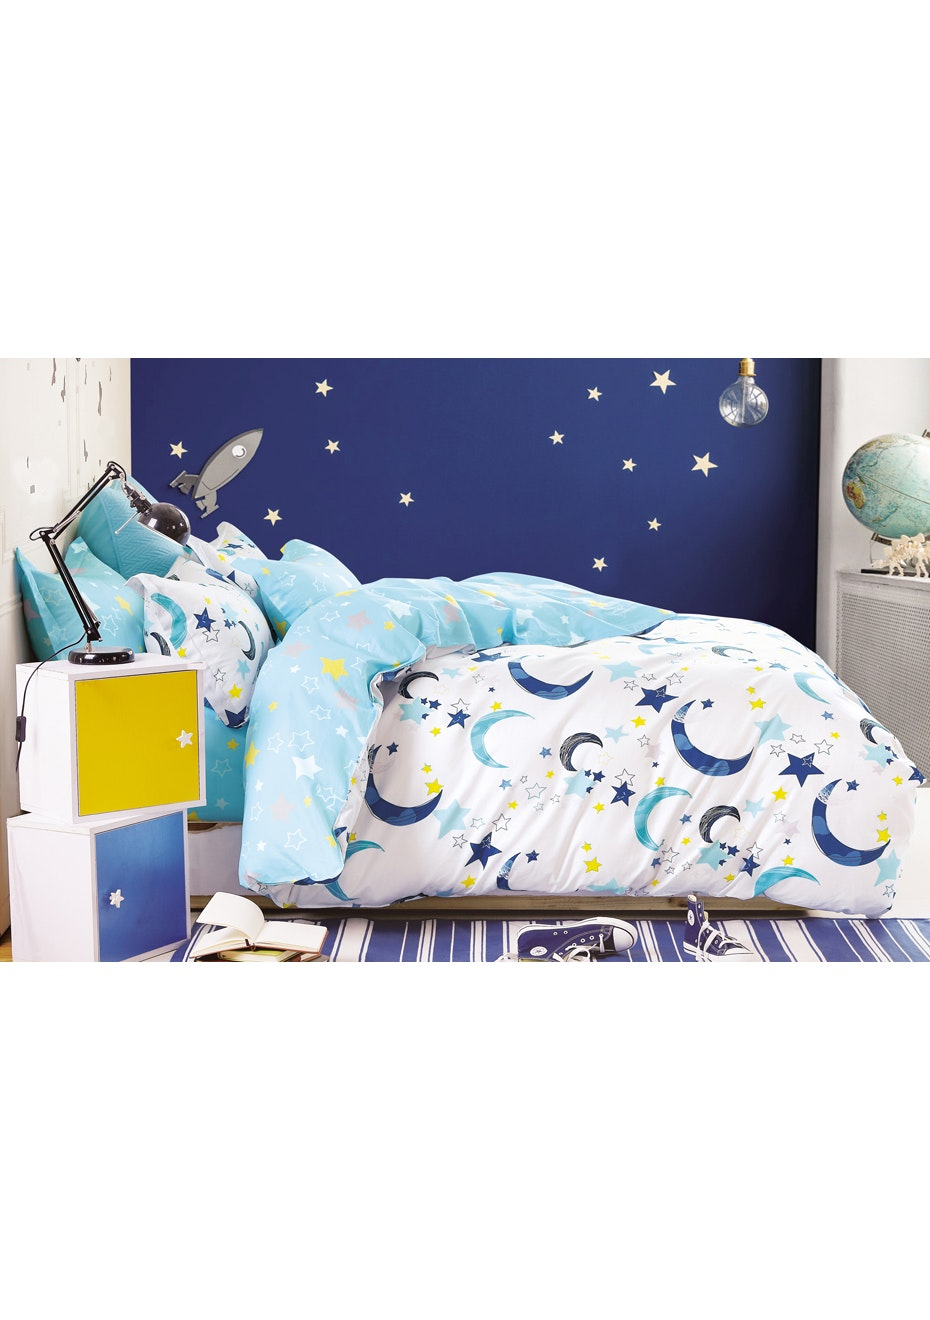 Galaxy Quilt Cover Set - Reversible Design - 100% Cotton - Double Bed